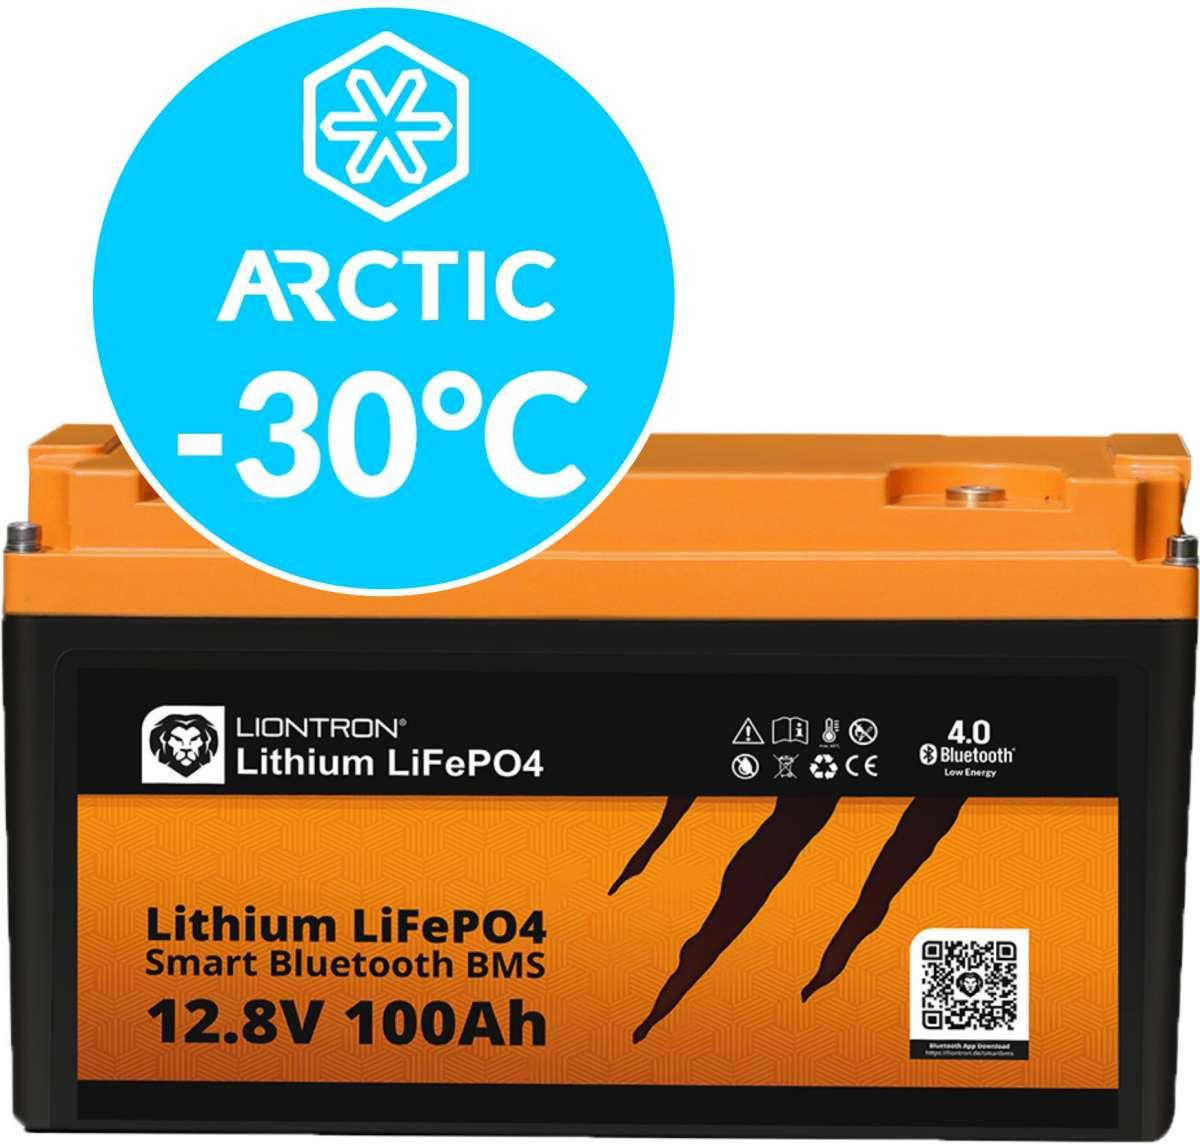 Liontron LiFePO4 LX Smart BMS 12.8V 100Ah Arctic 4